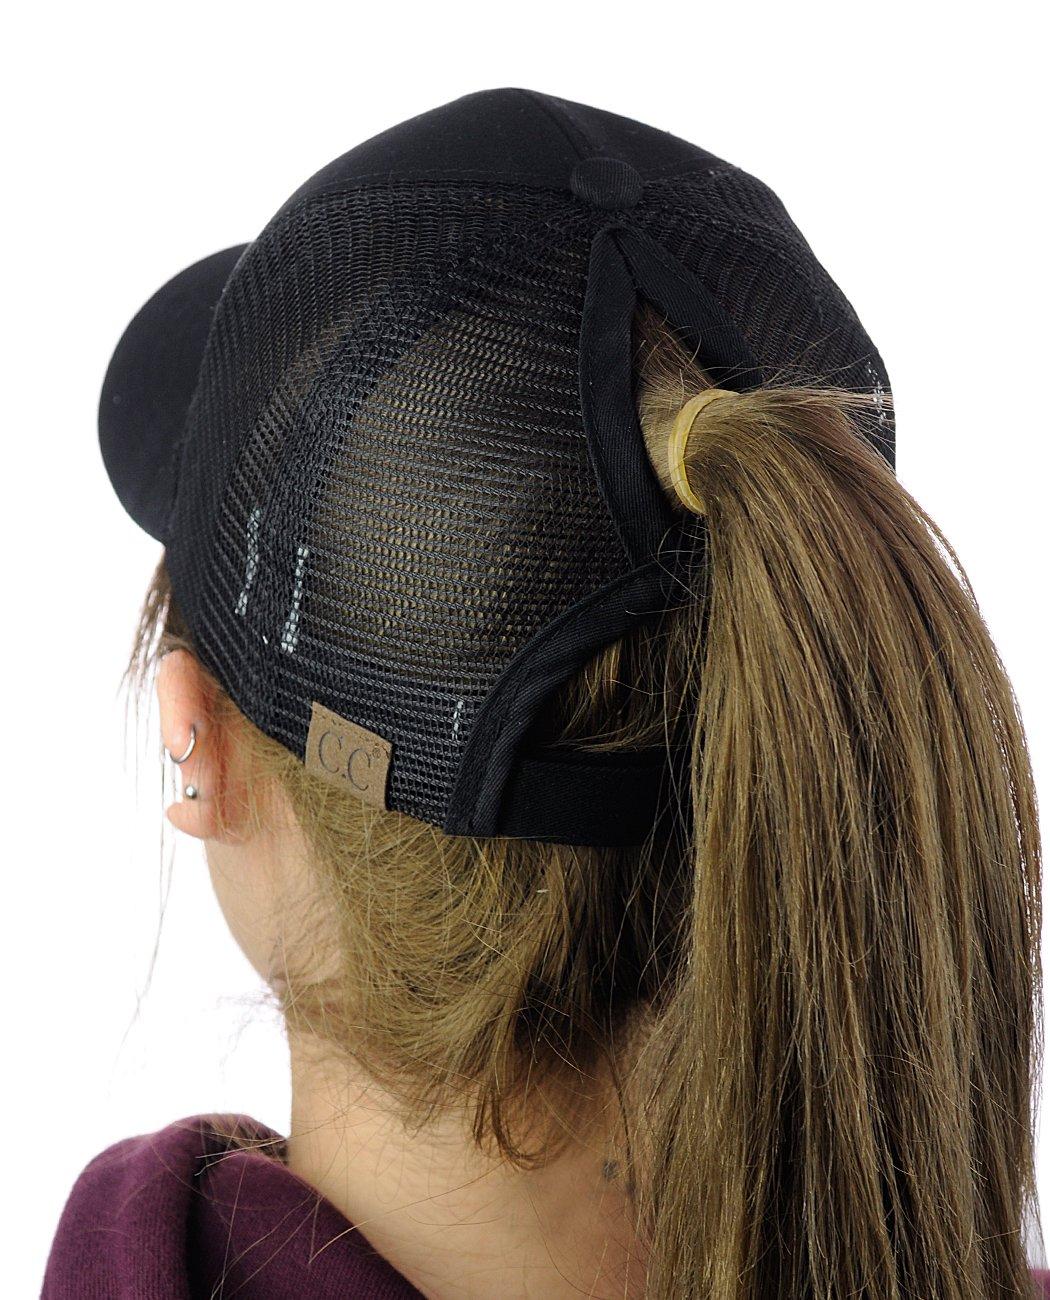 C.C Ponycap Messy High Bun Ponytail Adjustable Mesh Trucker Baseball Cap Hat, Black by C.C